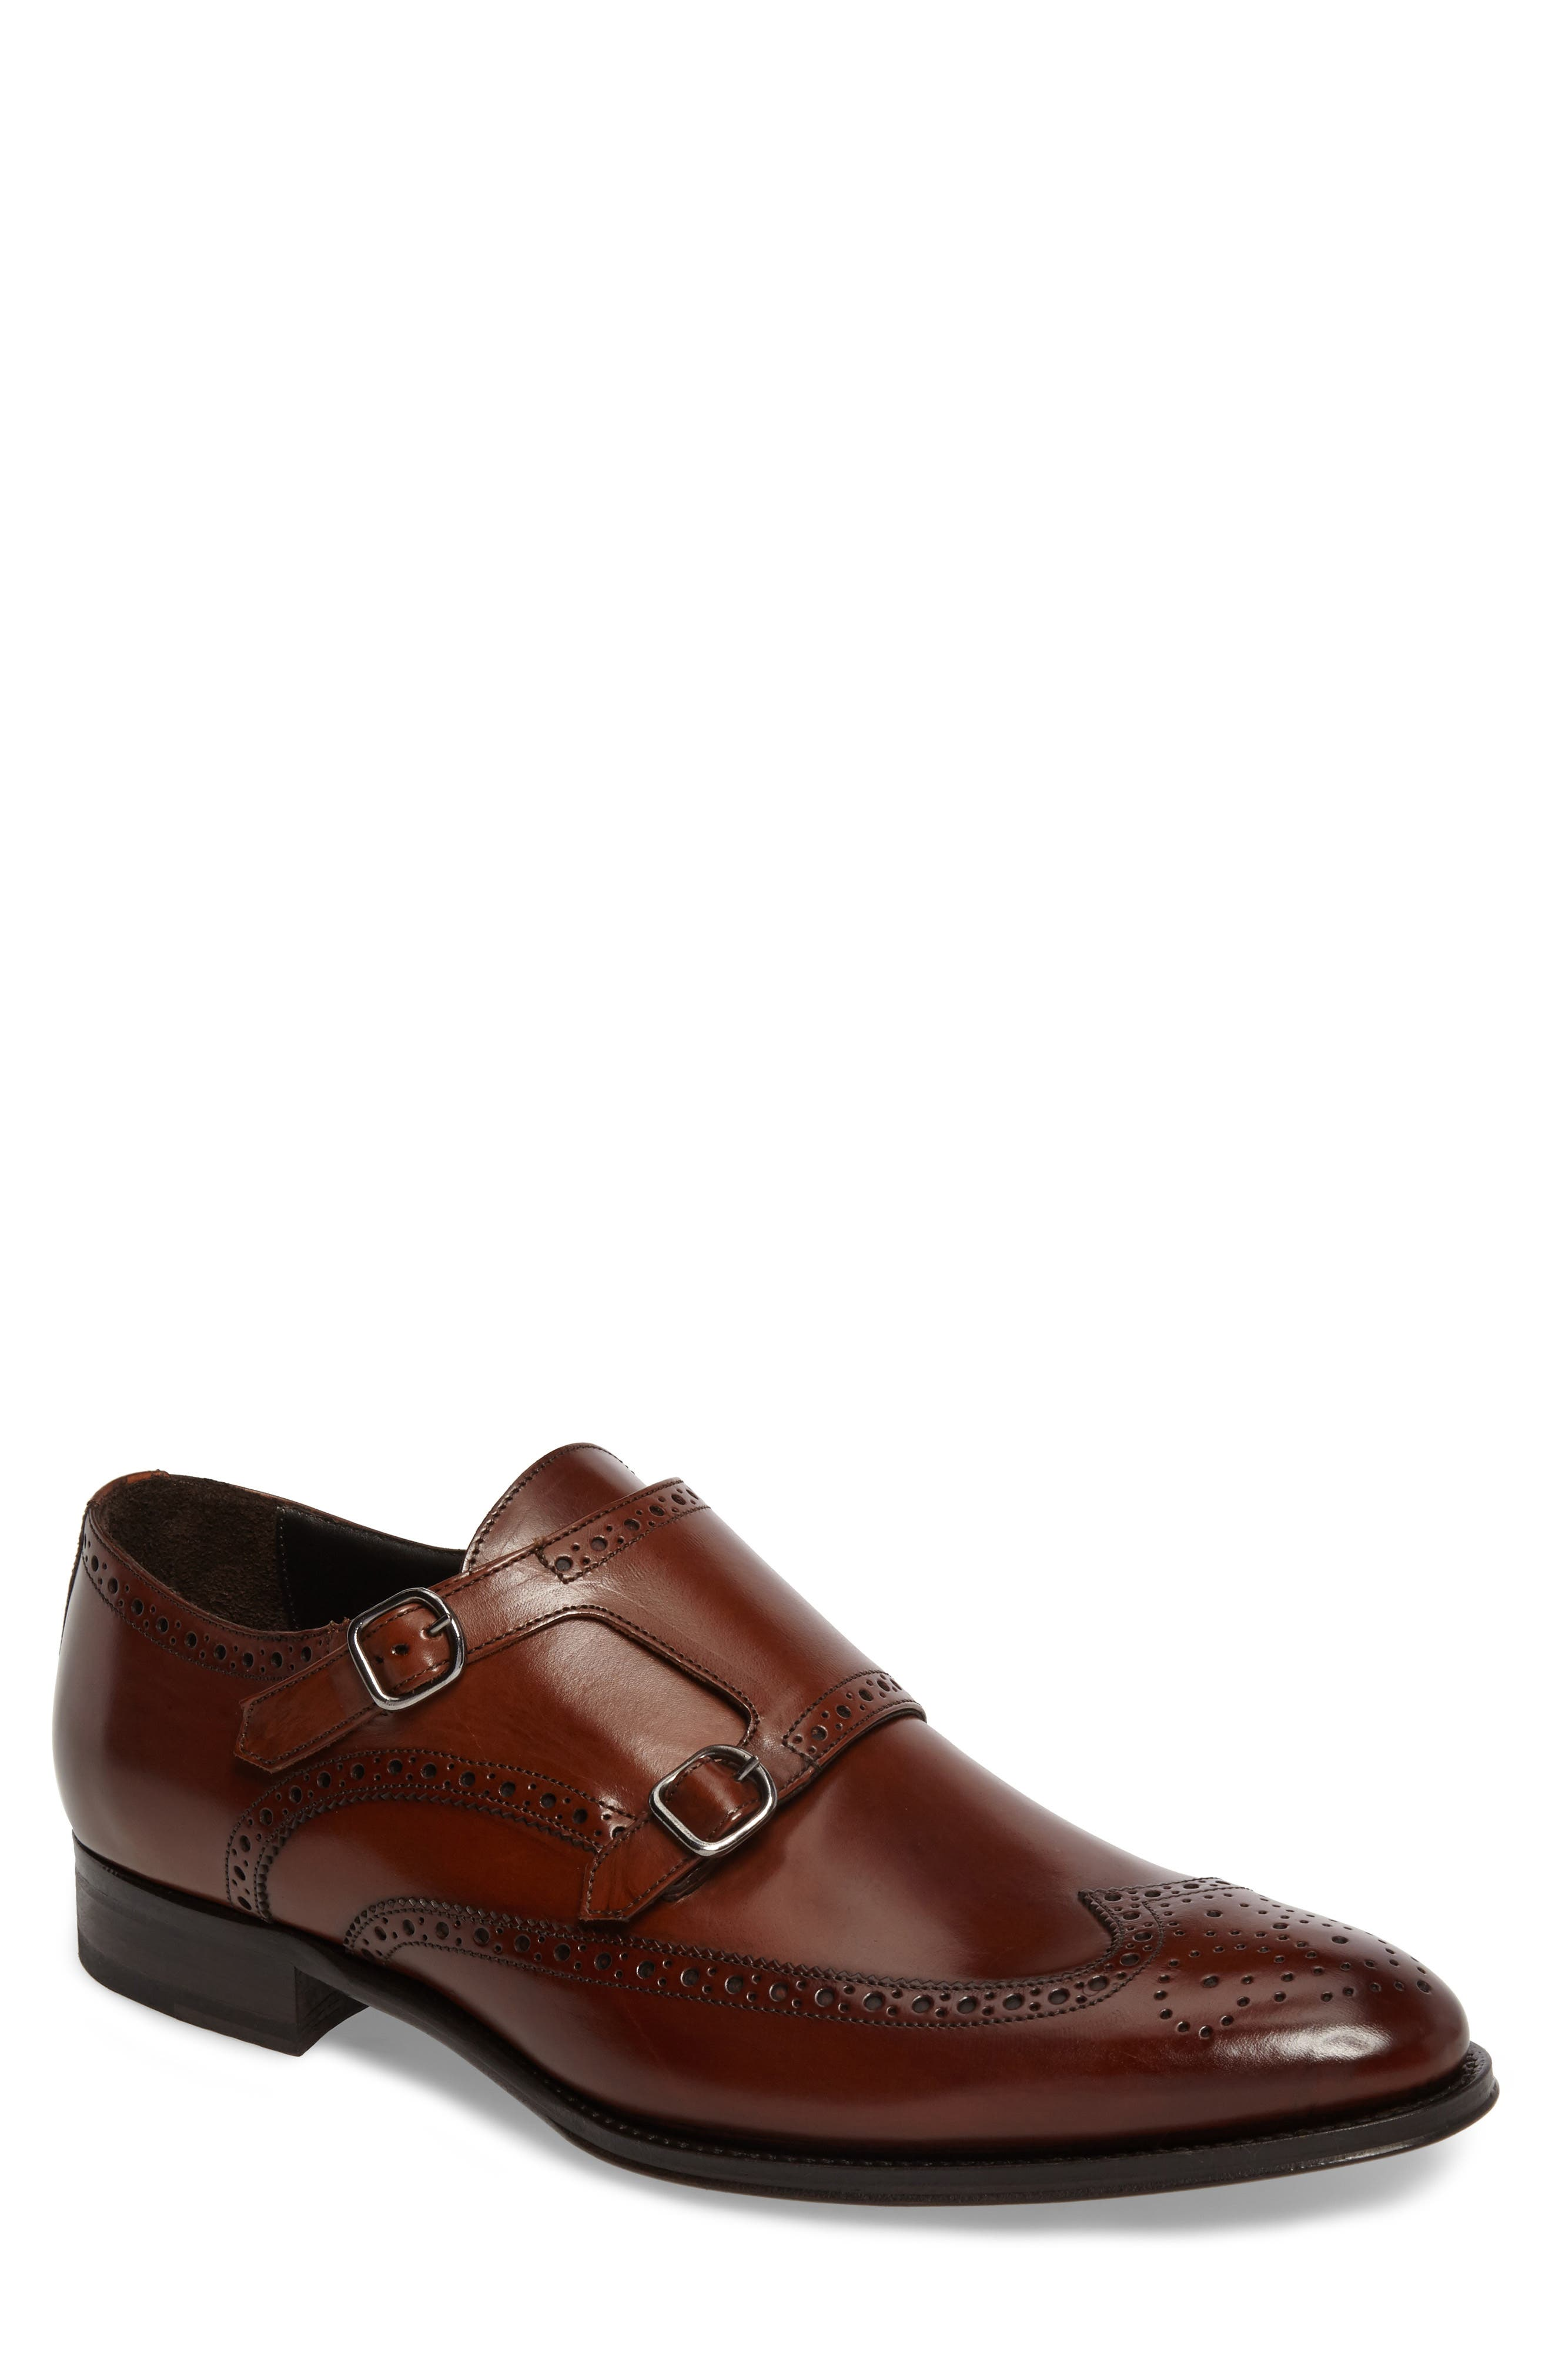 Pike Double Monk Strap Shoe,                             Main thumbnail 1, color,                             237